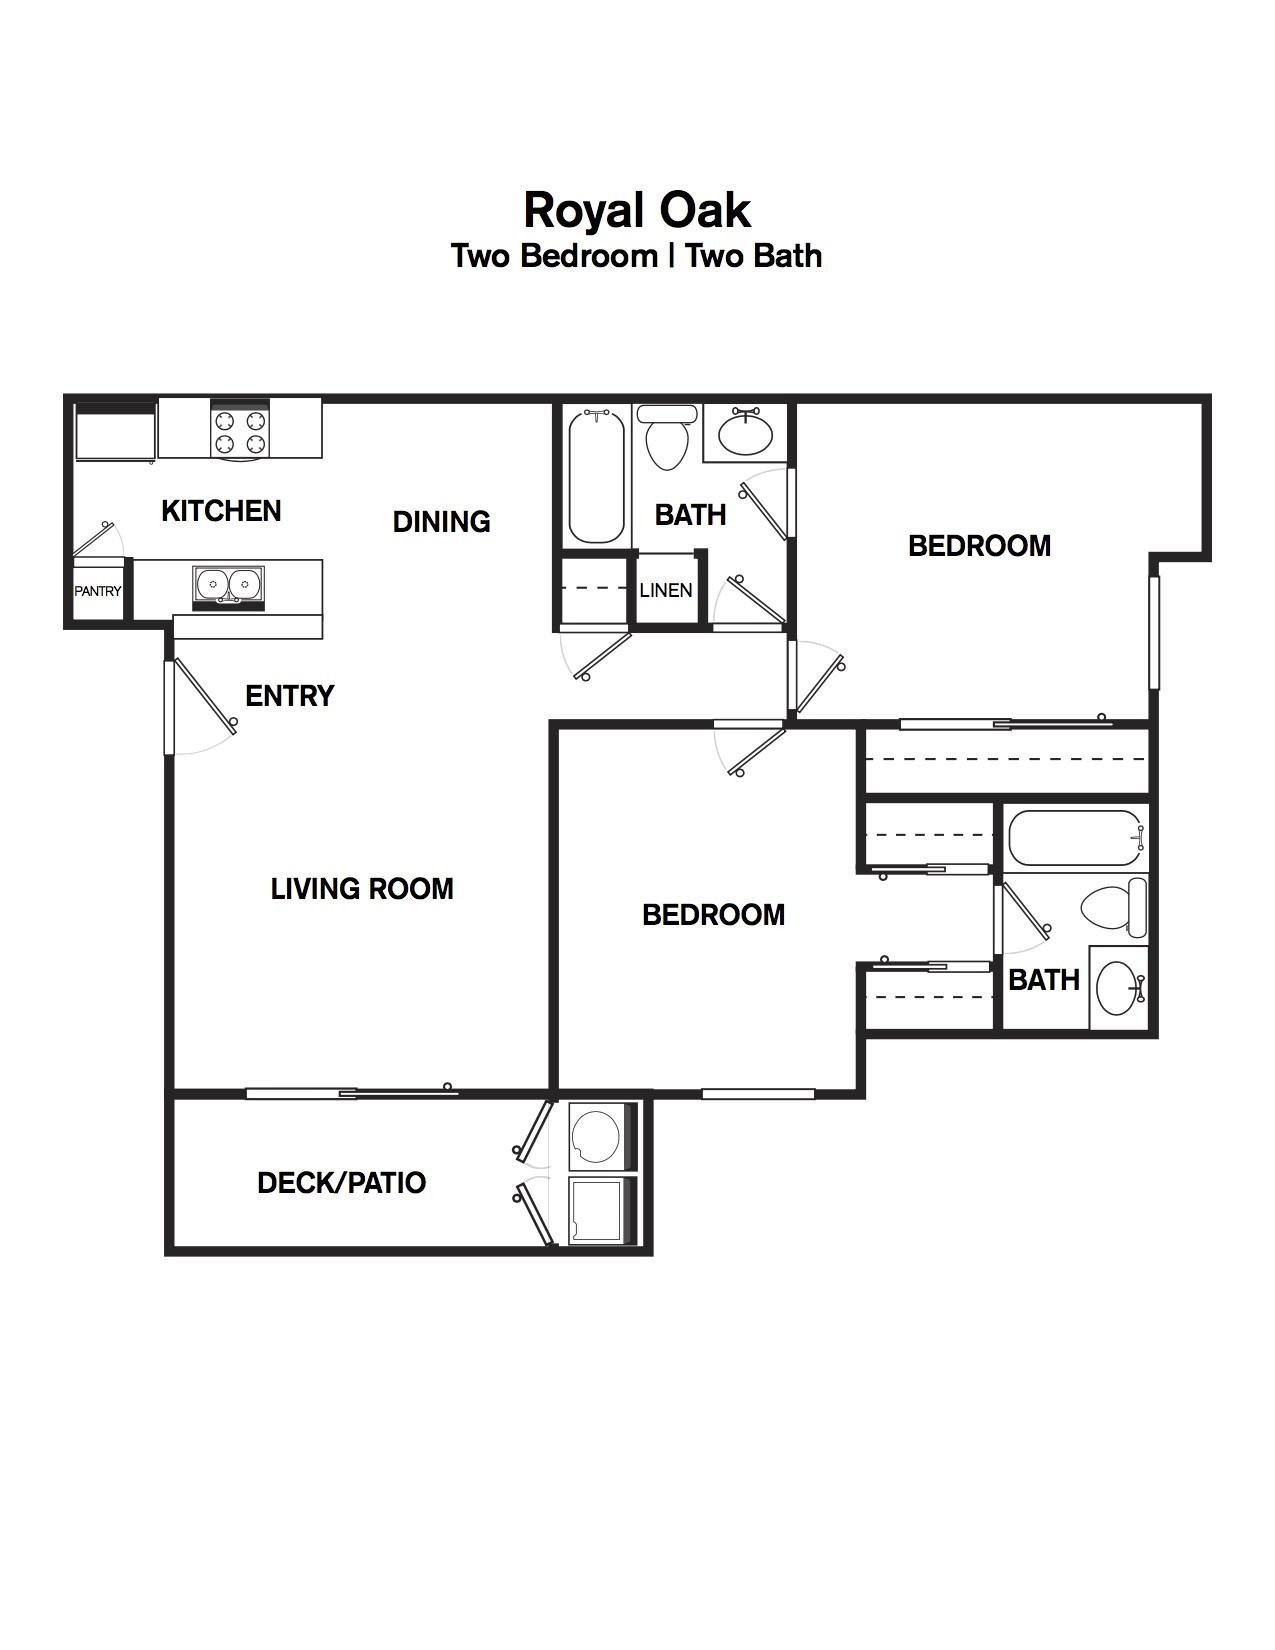 royal oak - two bedroom two bath